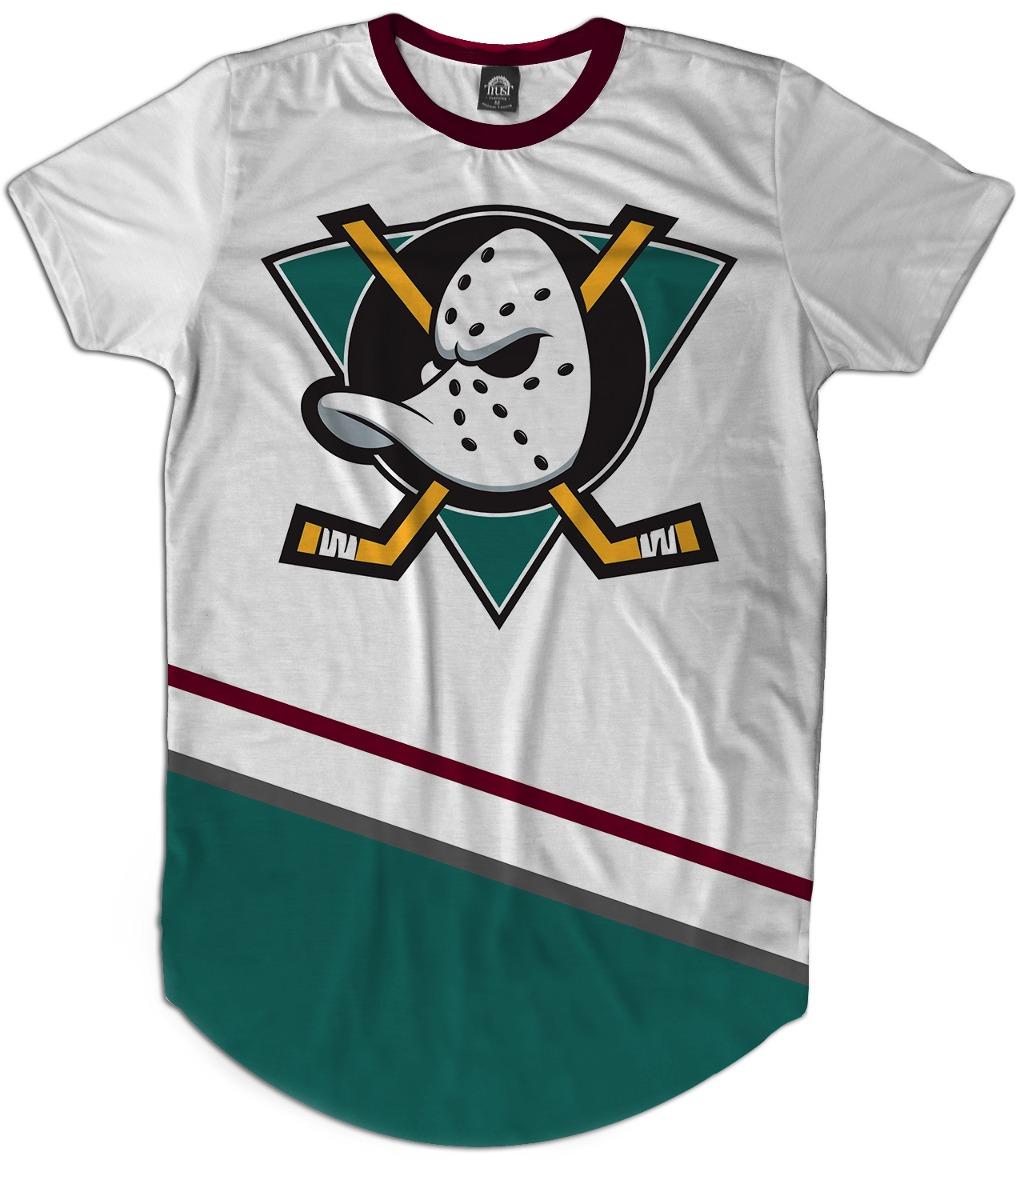 9328b8ff2ff9a anaheim ducks time hockey camiseta oversized personalizada. Carregando zoom.